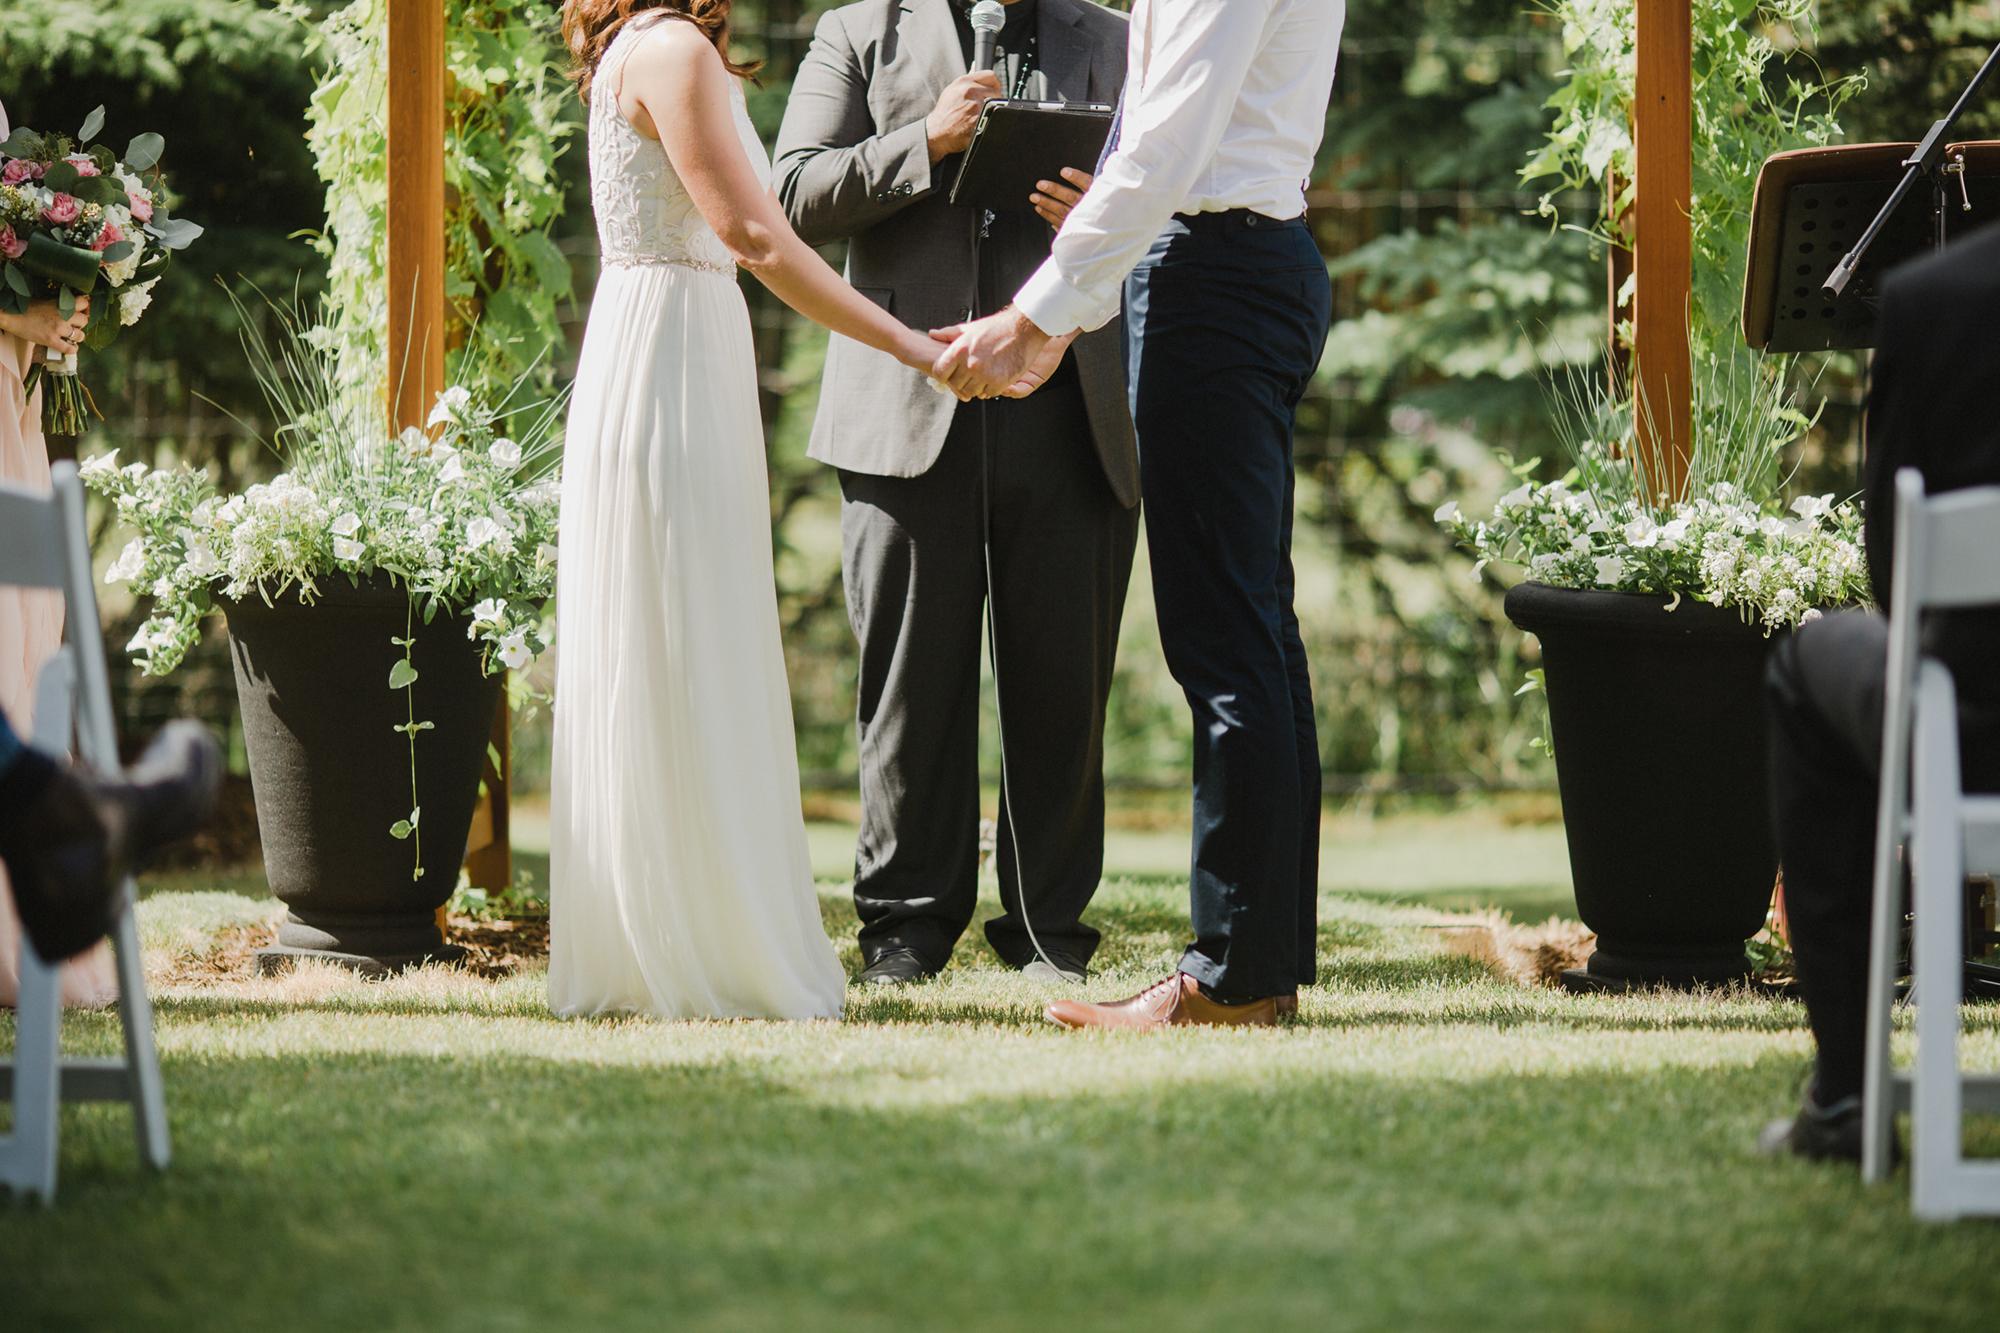 Flower Farm Crowsnest Pass Wedding -060.JPG